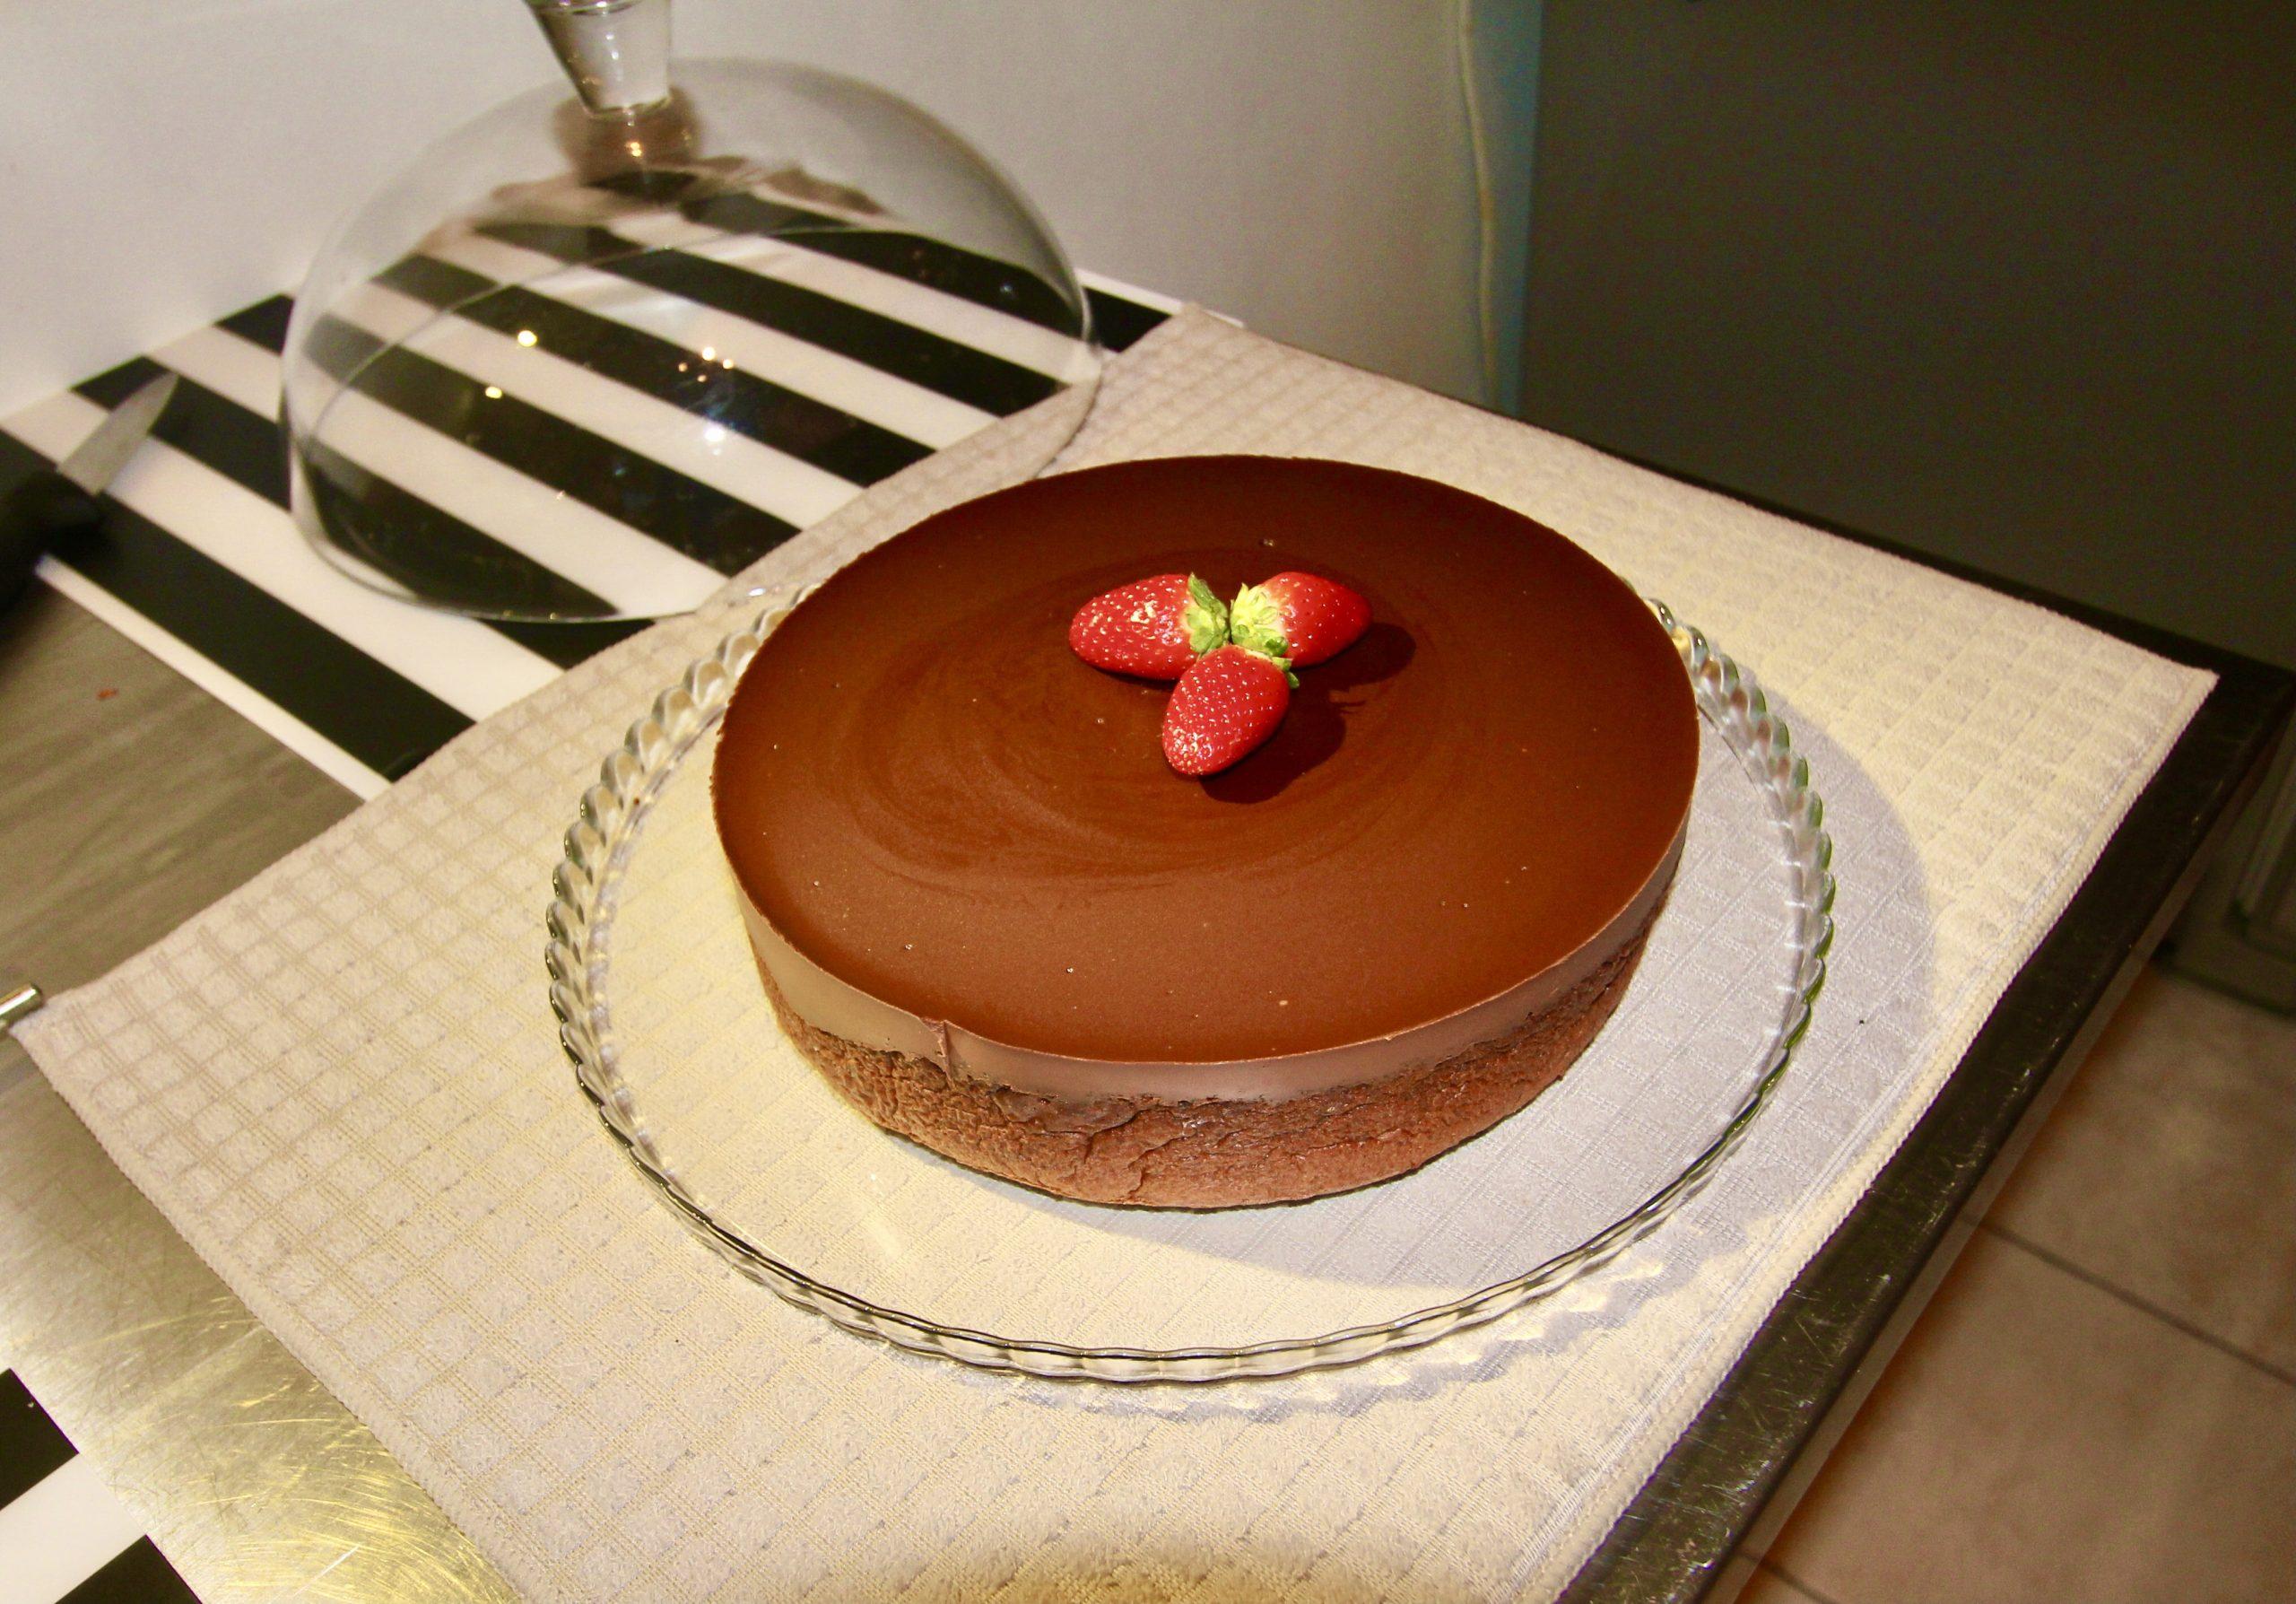 Rich chocolate cake with hazelnuts